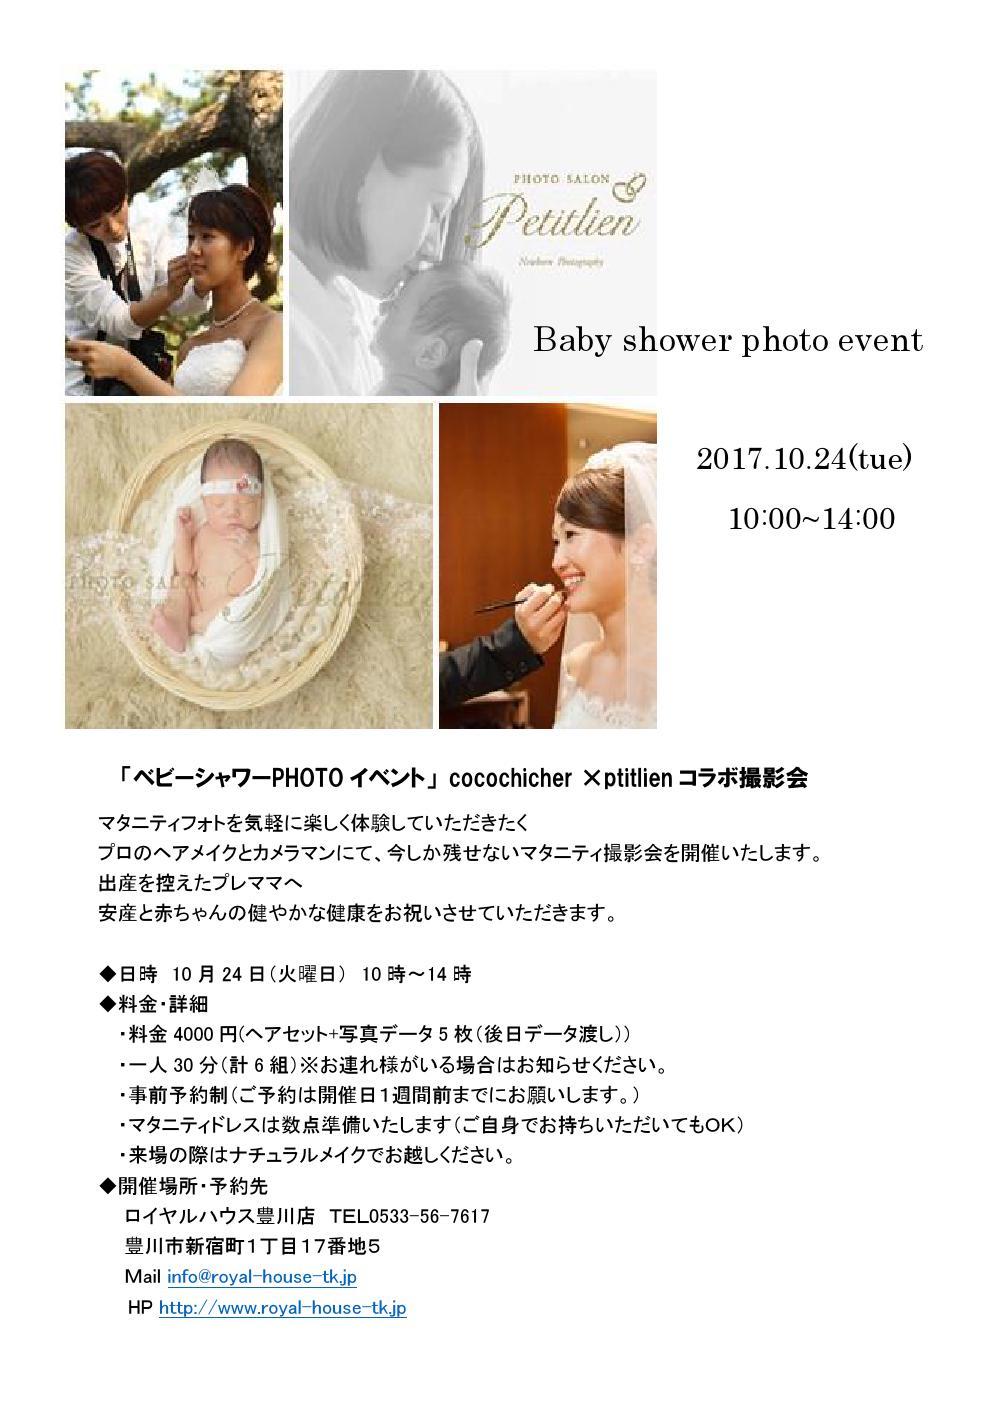 Baby shawer photo event